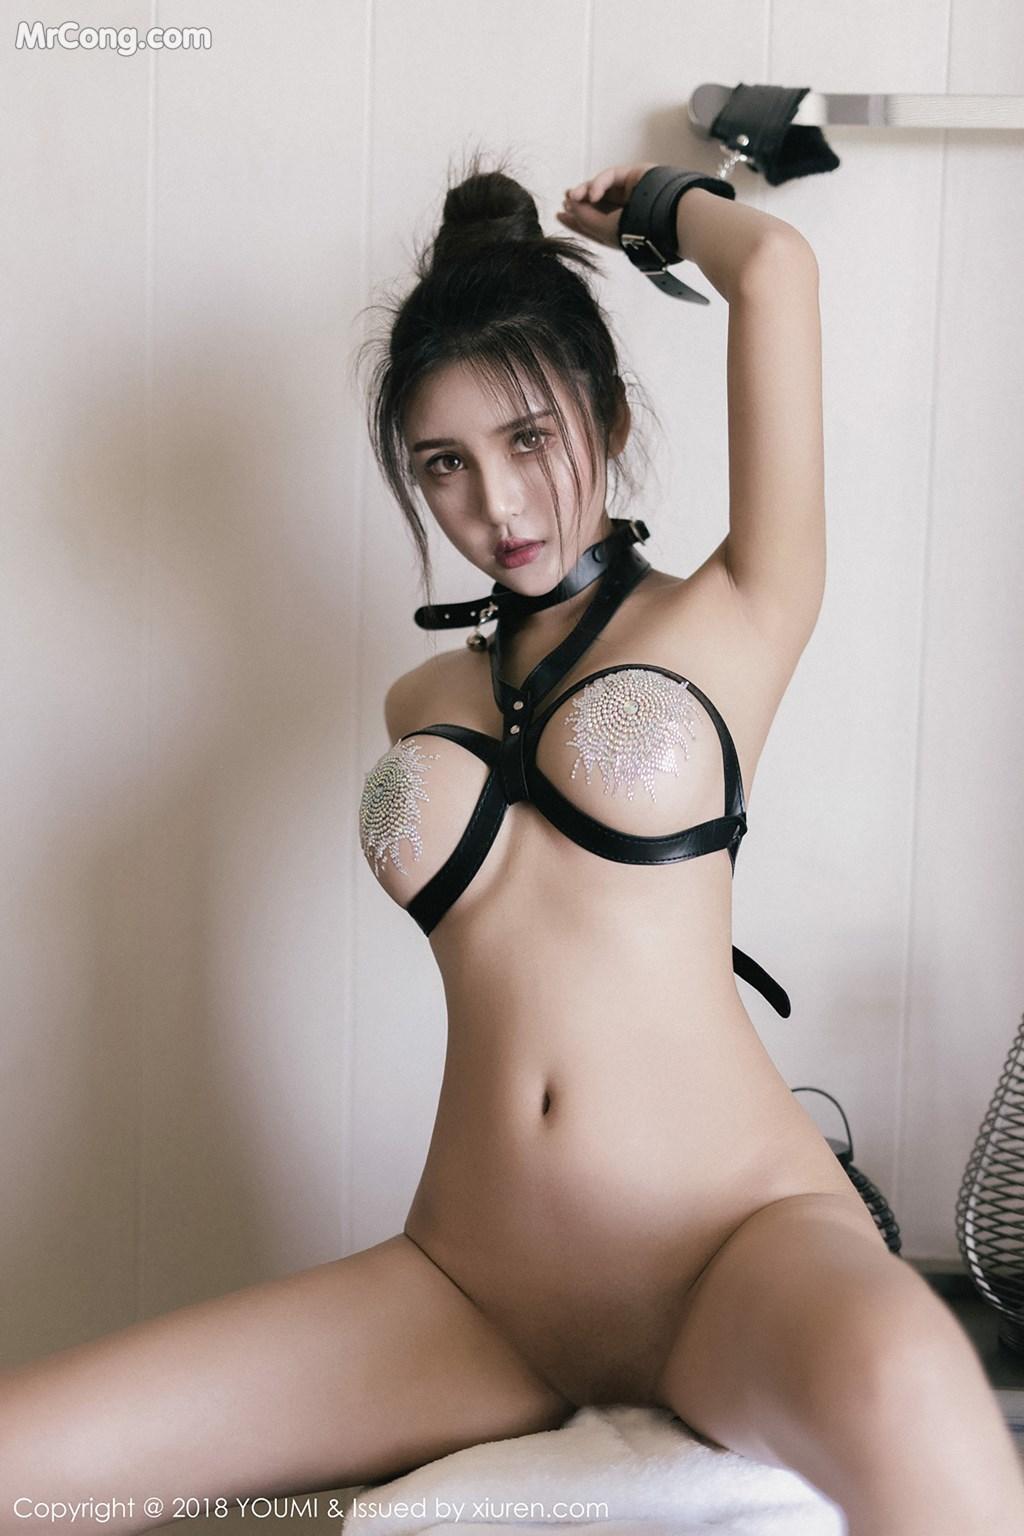 Image YouMi-Vol.226-SOLO-MrCong.com-008 in post YouMi Vol.226: Người mẫu SOLO-尹菲 (41 ảnh)